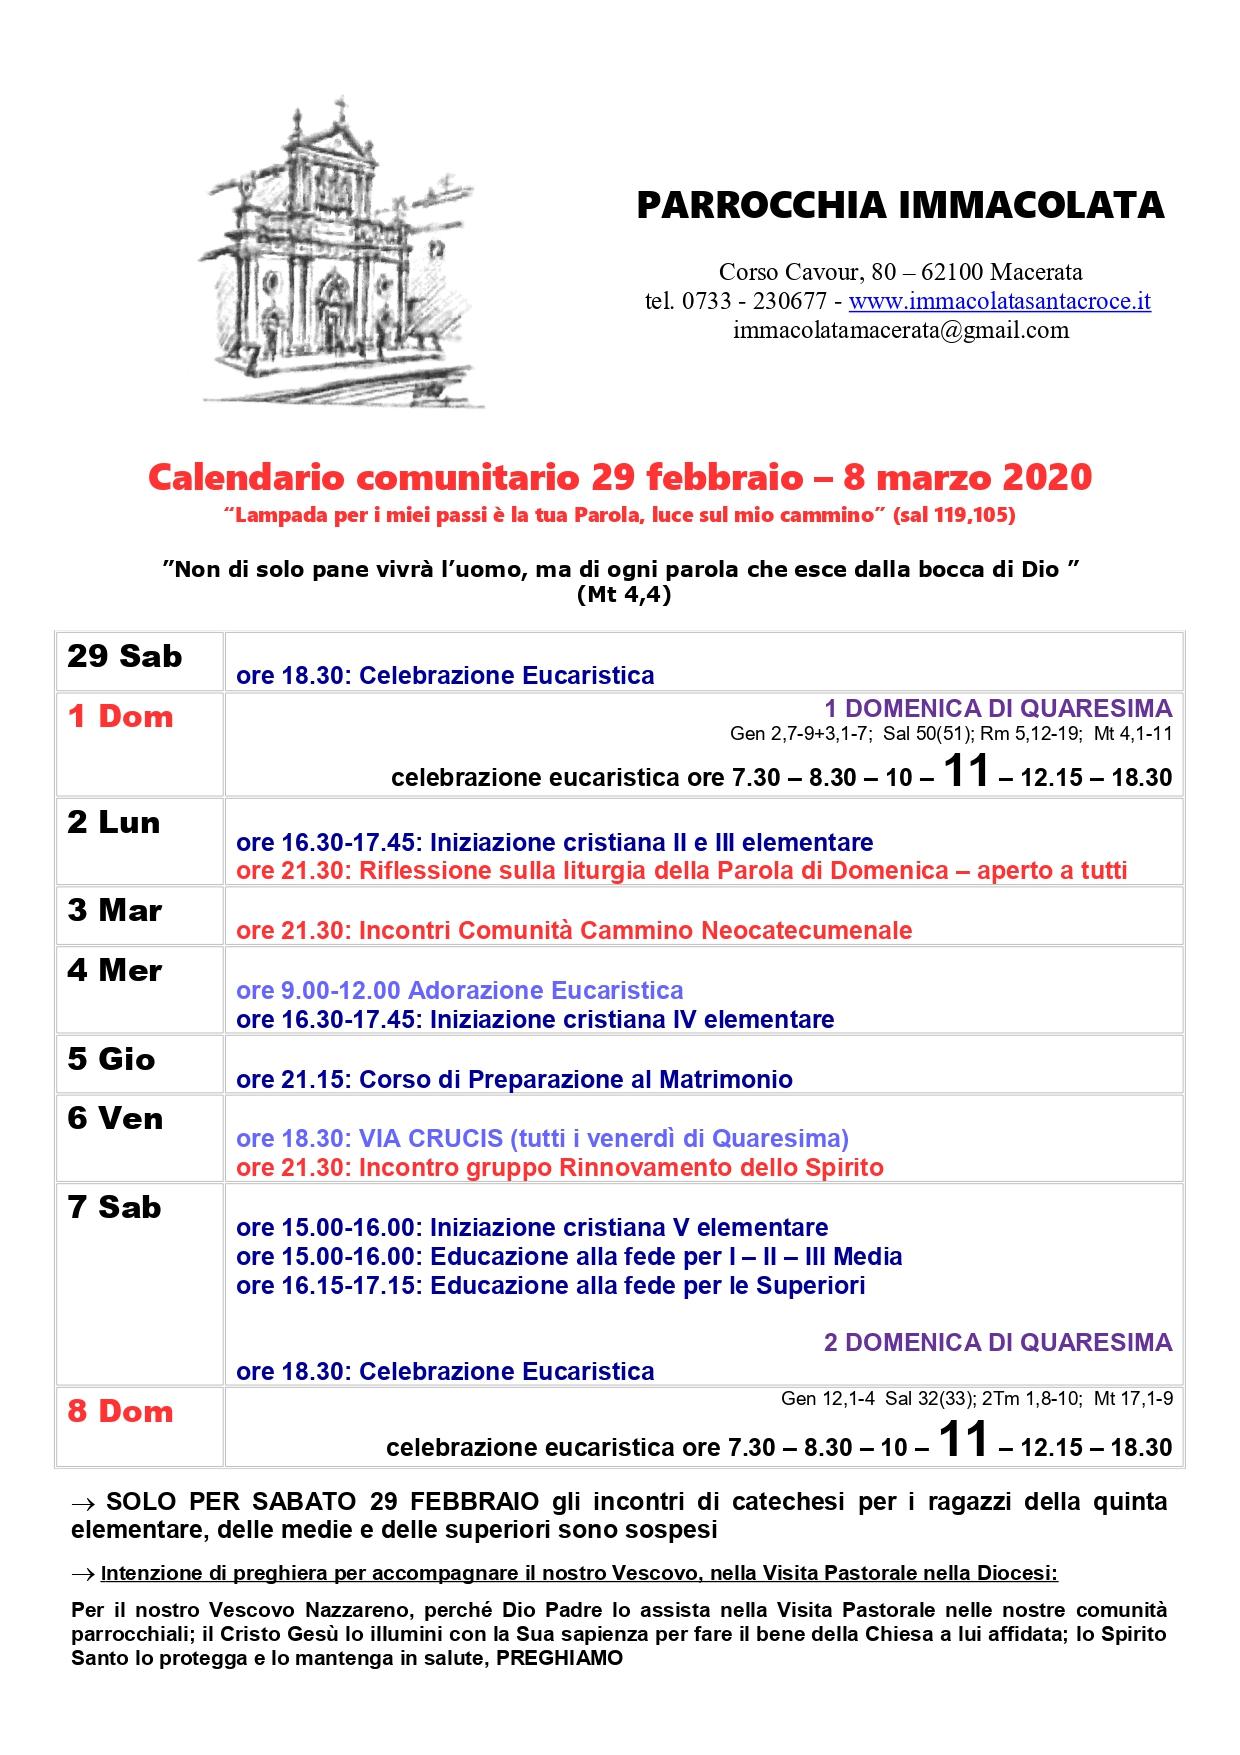 03.MARZO 01 (29.02-8.03)_page-0001 (1)